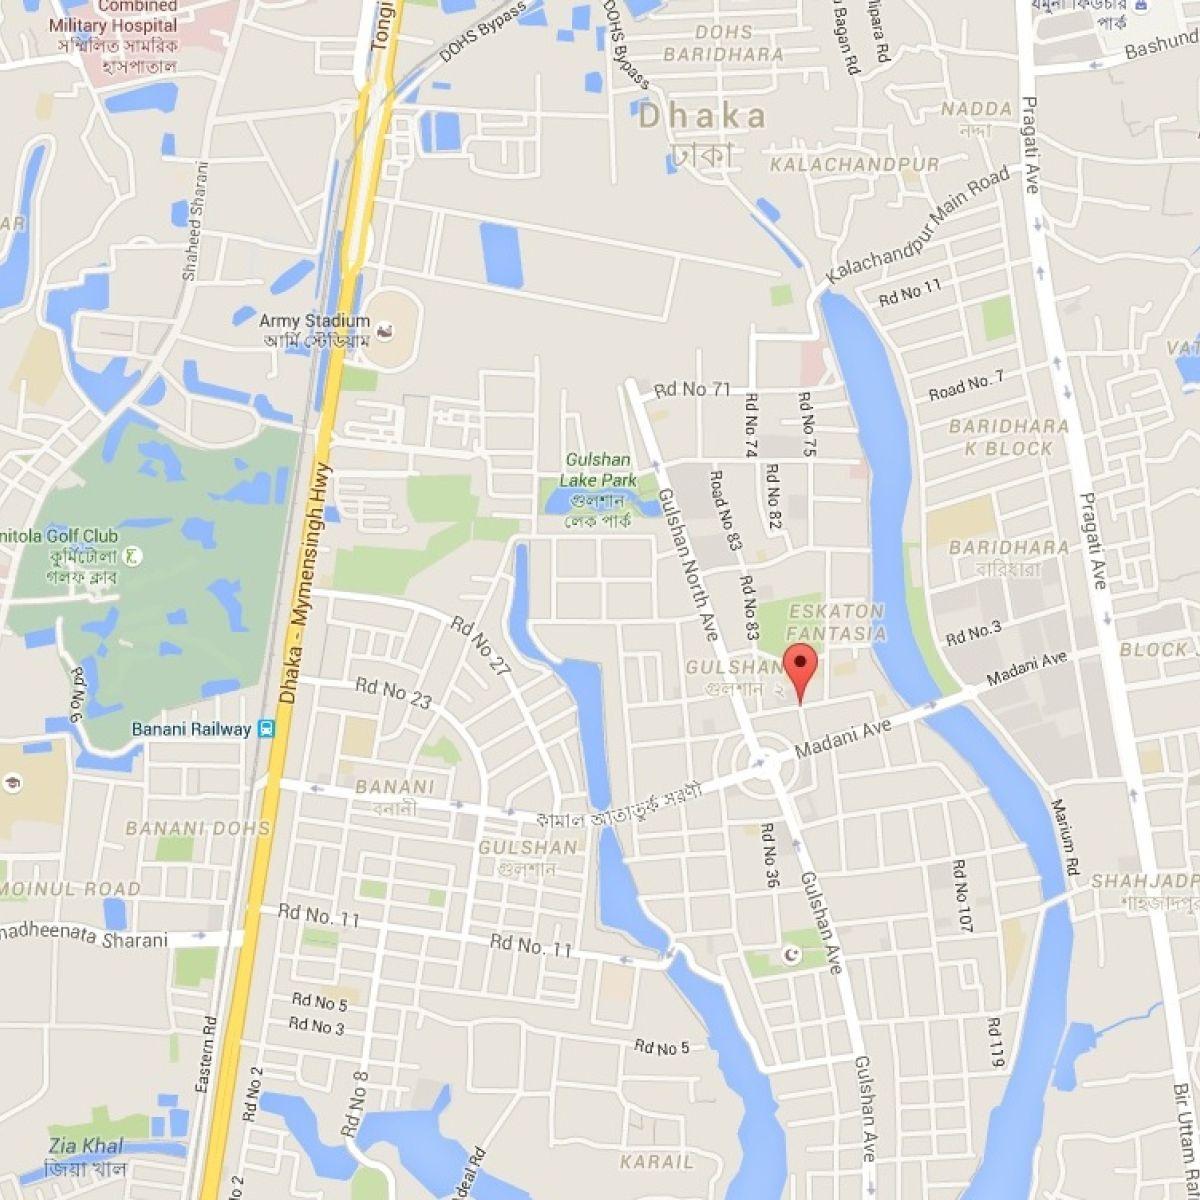 Italian man killed in suspected terrorist attack in Bangladesh